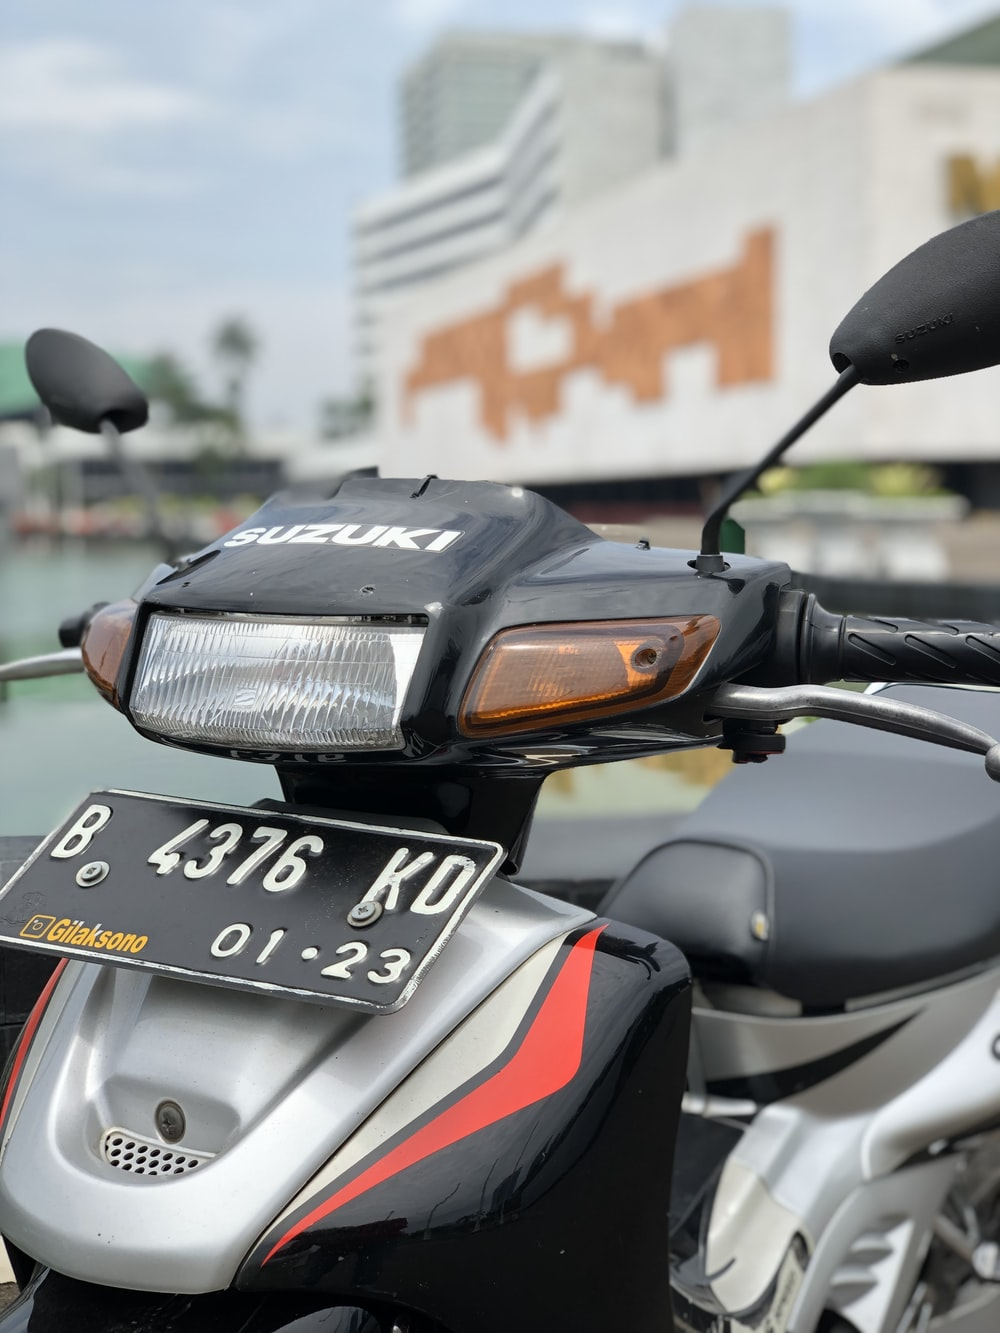 black and gray Suzuki motorcycle